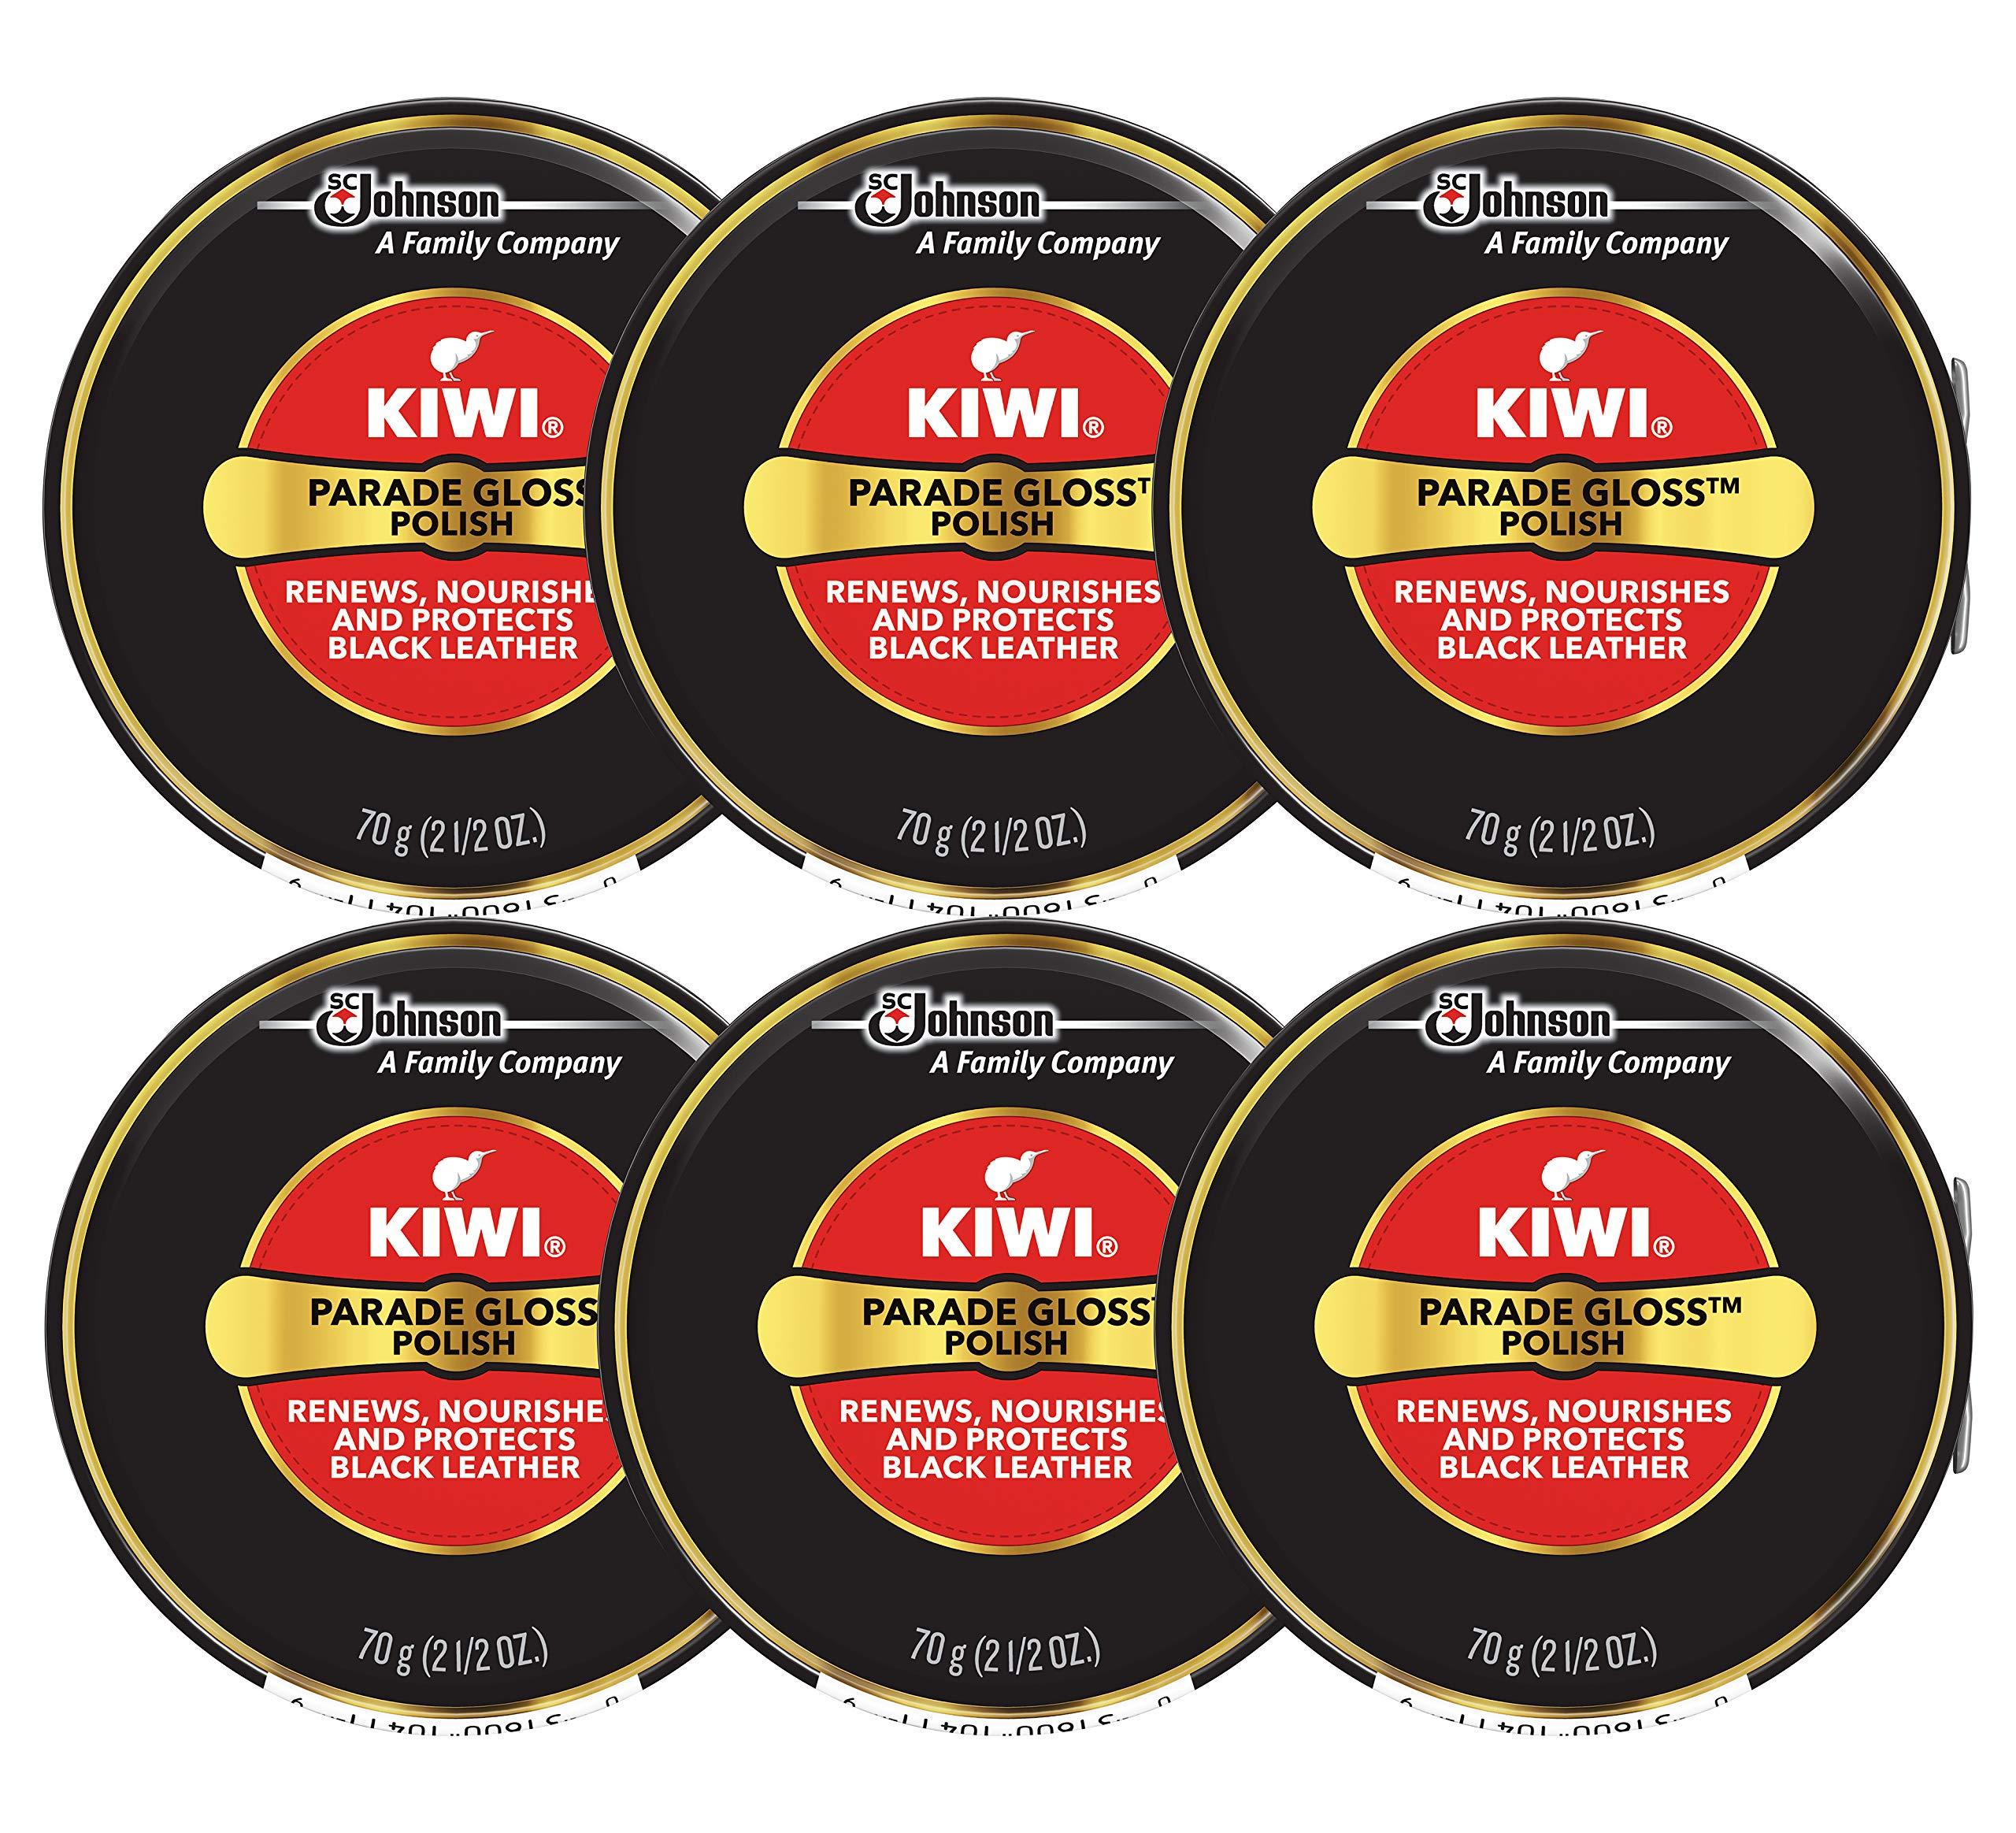 Kiwi Parade Gloss Shoe Polish - Negro - 2.5 Oz. - Grande